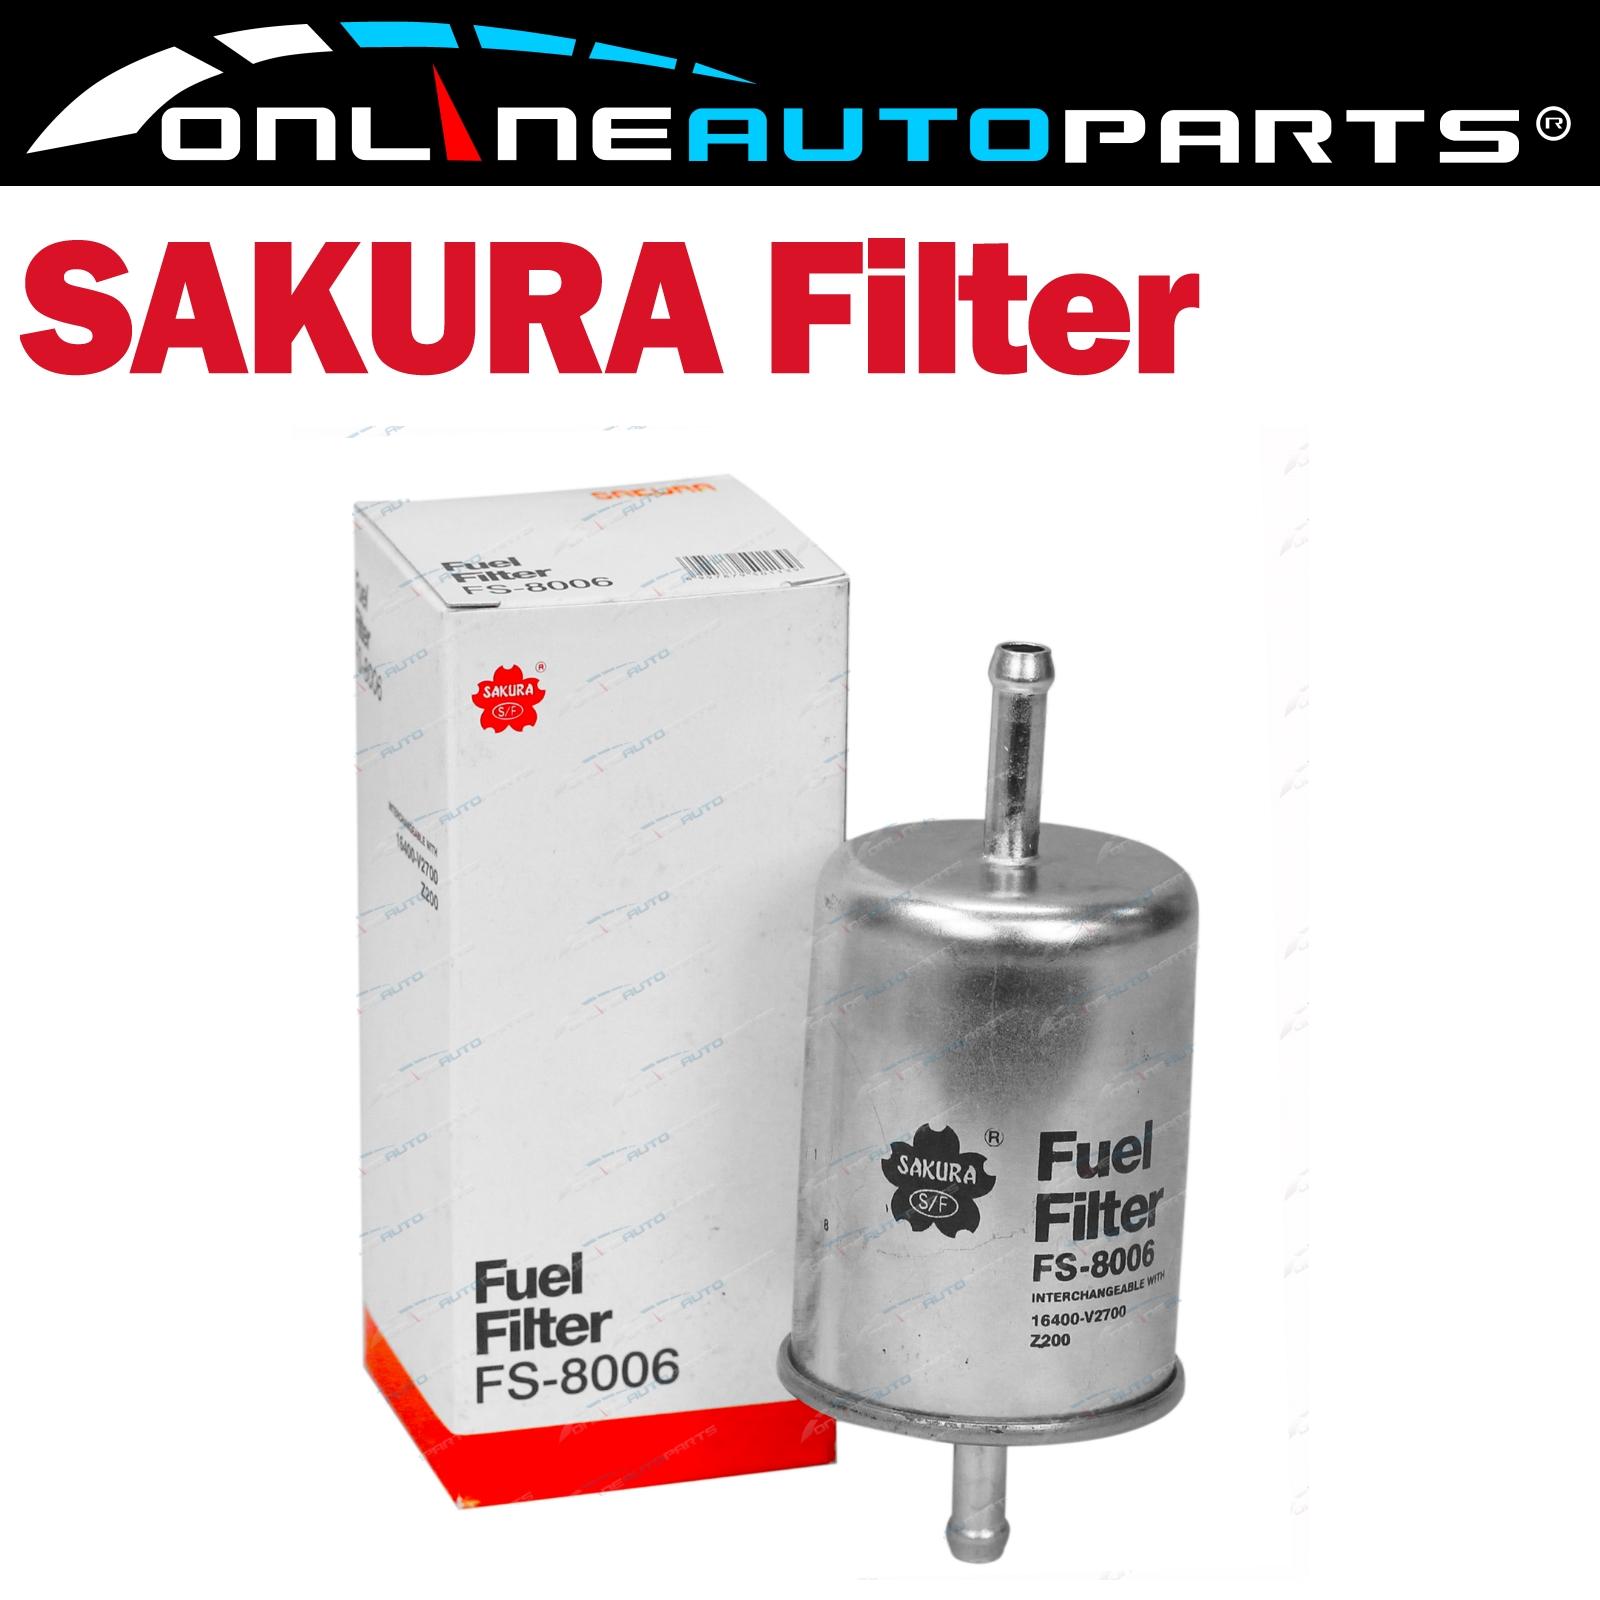 Sakura Fuel Filter FS-8006 Interchangeable with Ryco Z200